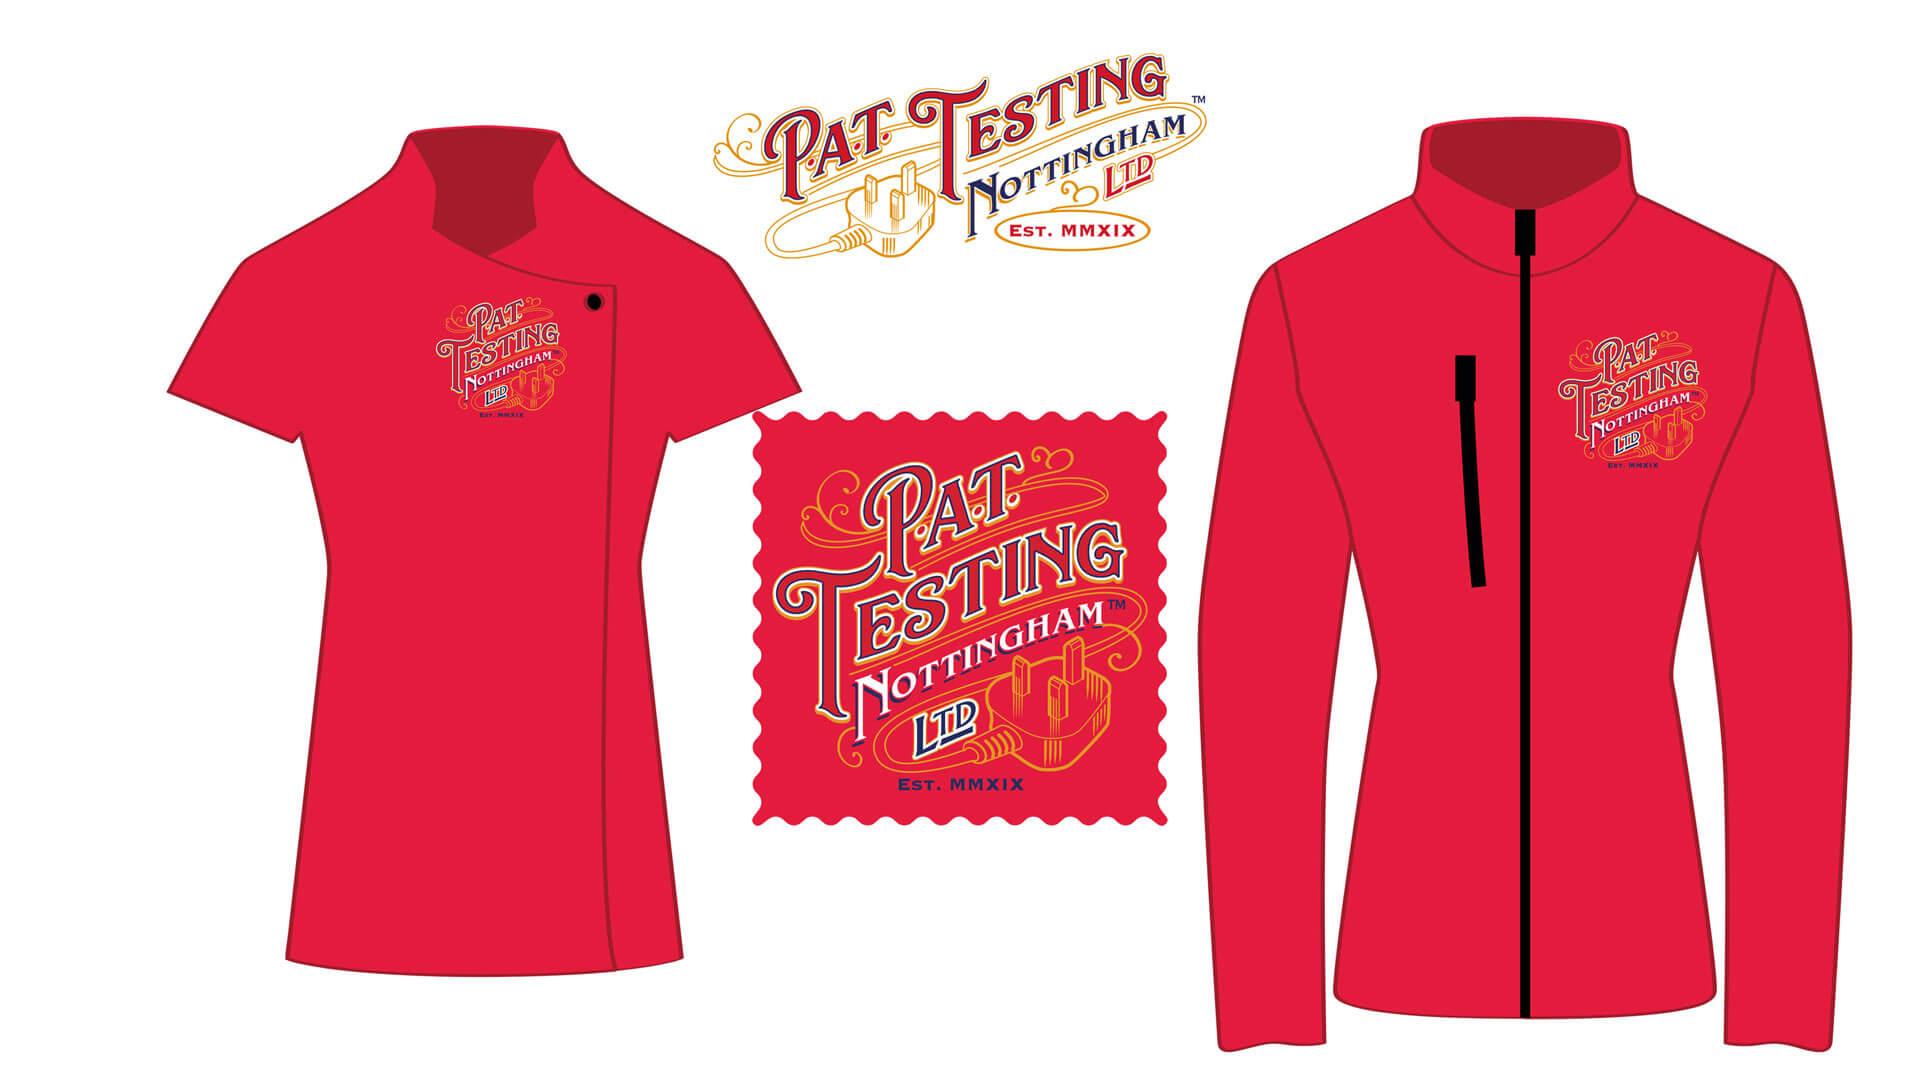 pat testing nottingham 6